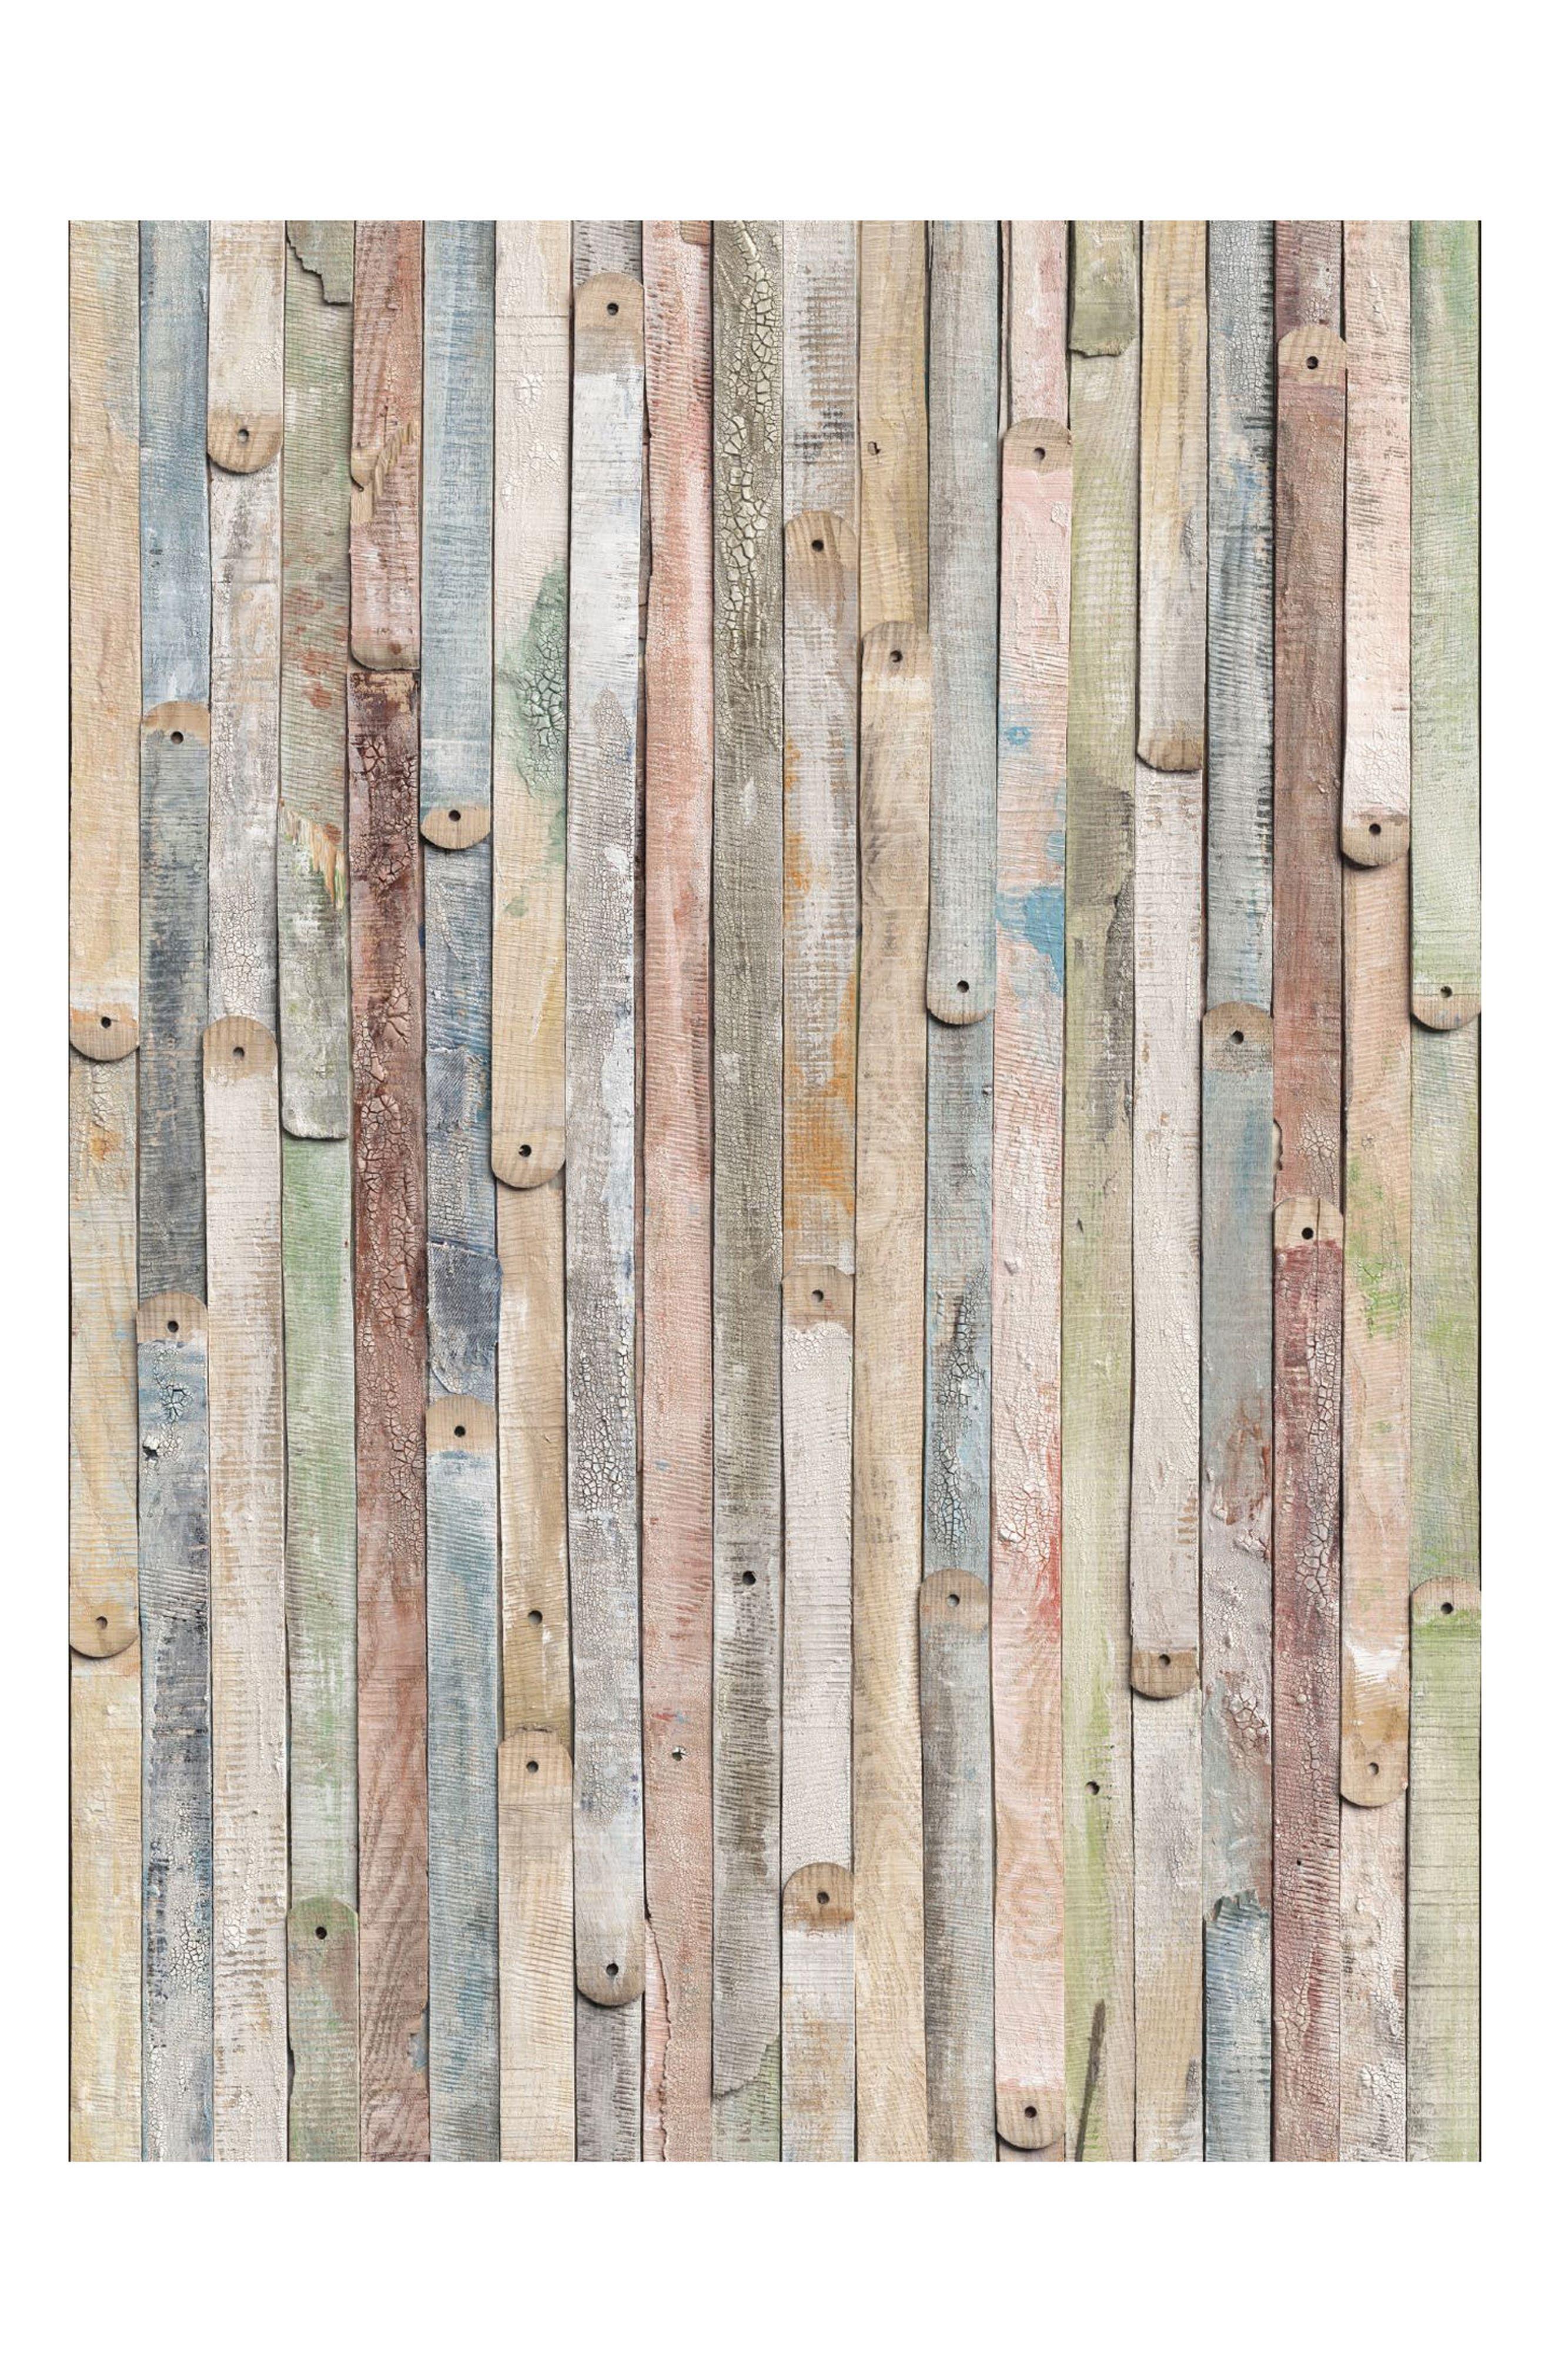 Vintage Wood Wall Mural,                             Main thumbnail 1, color,                             Neutral